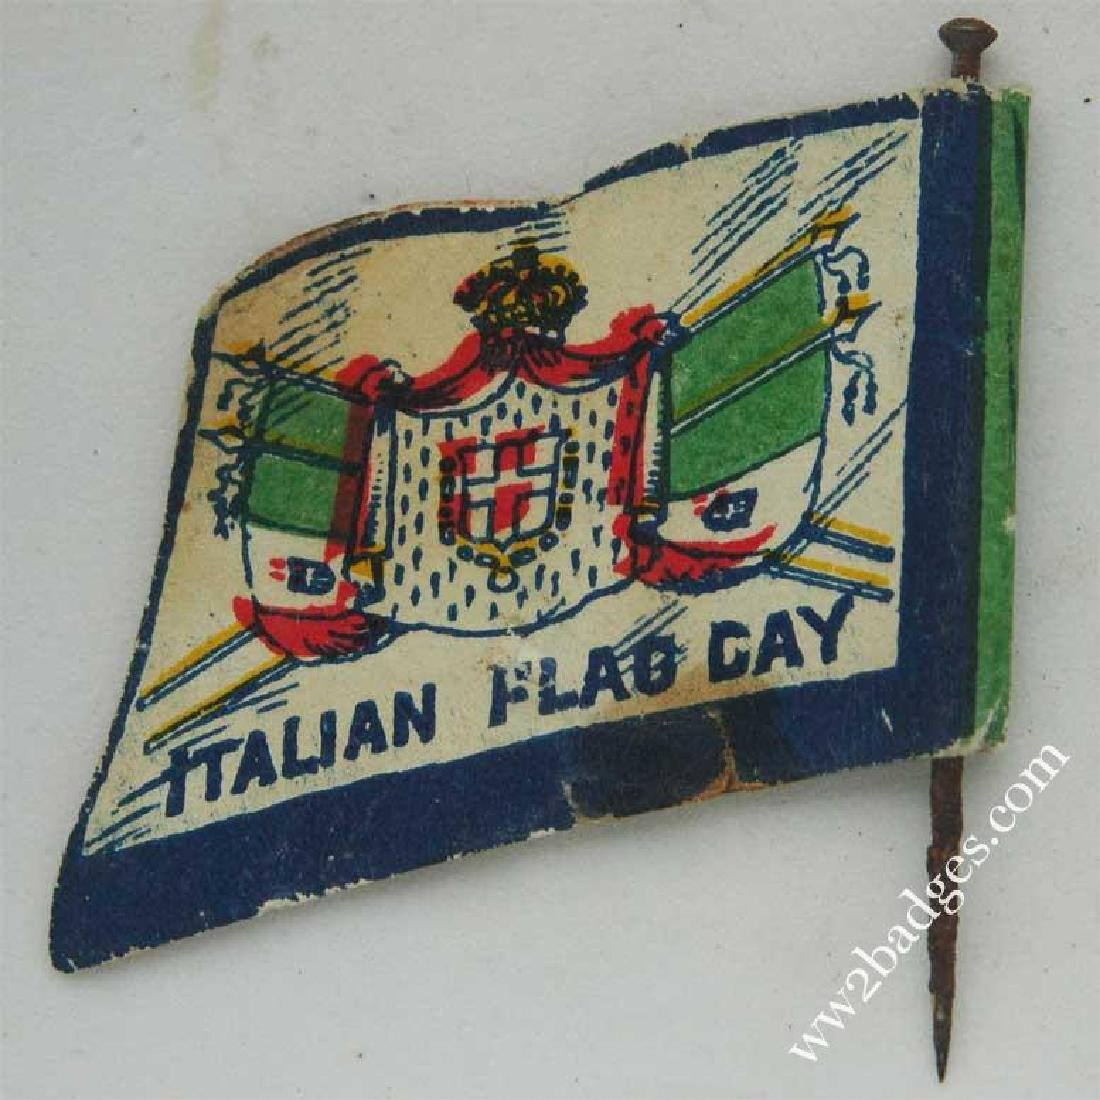 Flag Day Pin Badge: Italian Army Flag Allies War Effort - 3